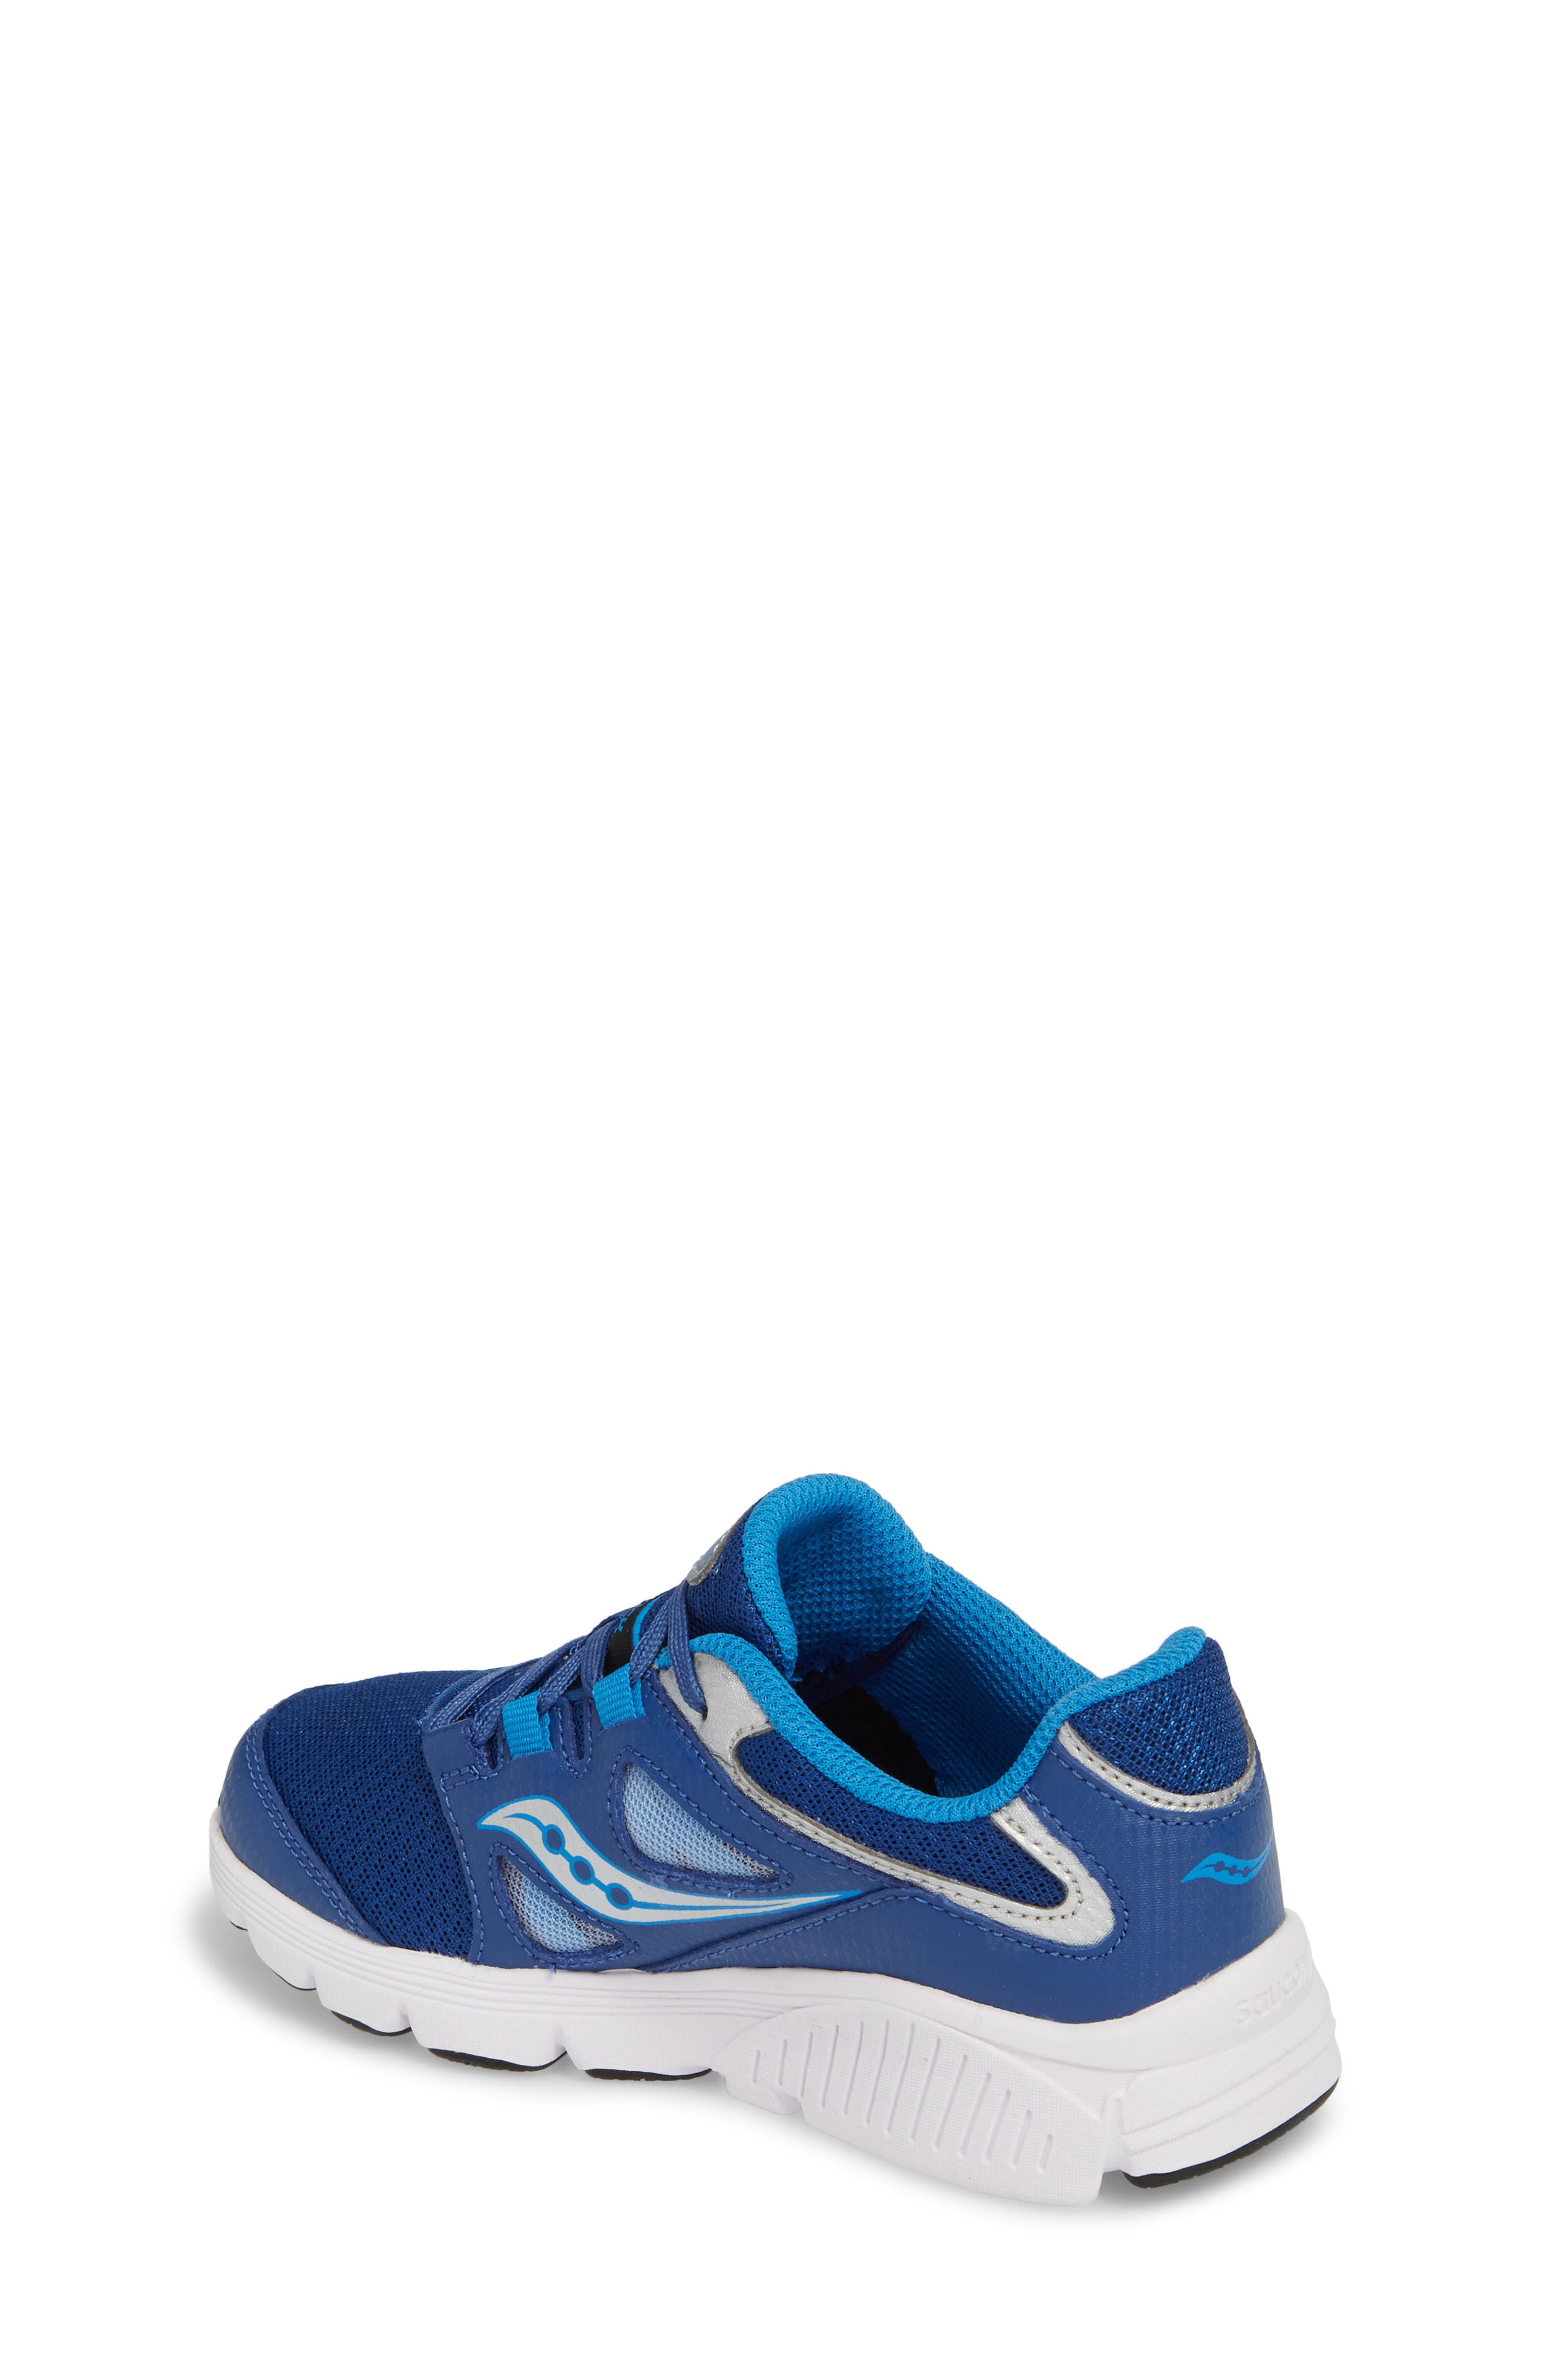 Kotaro 4 Sneaker,                             Alternate thumbnail 2, color,                             400